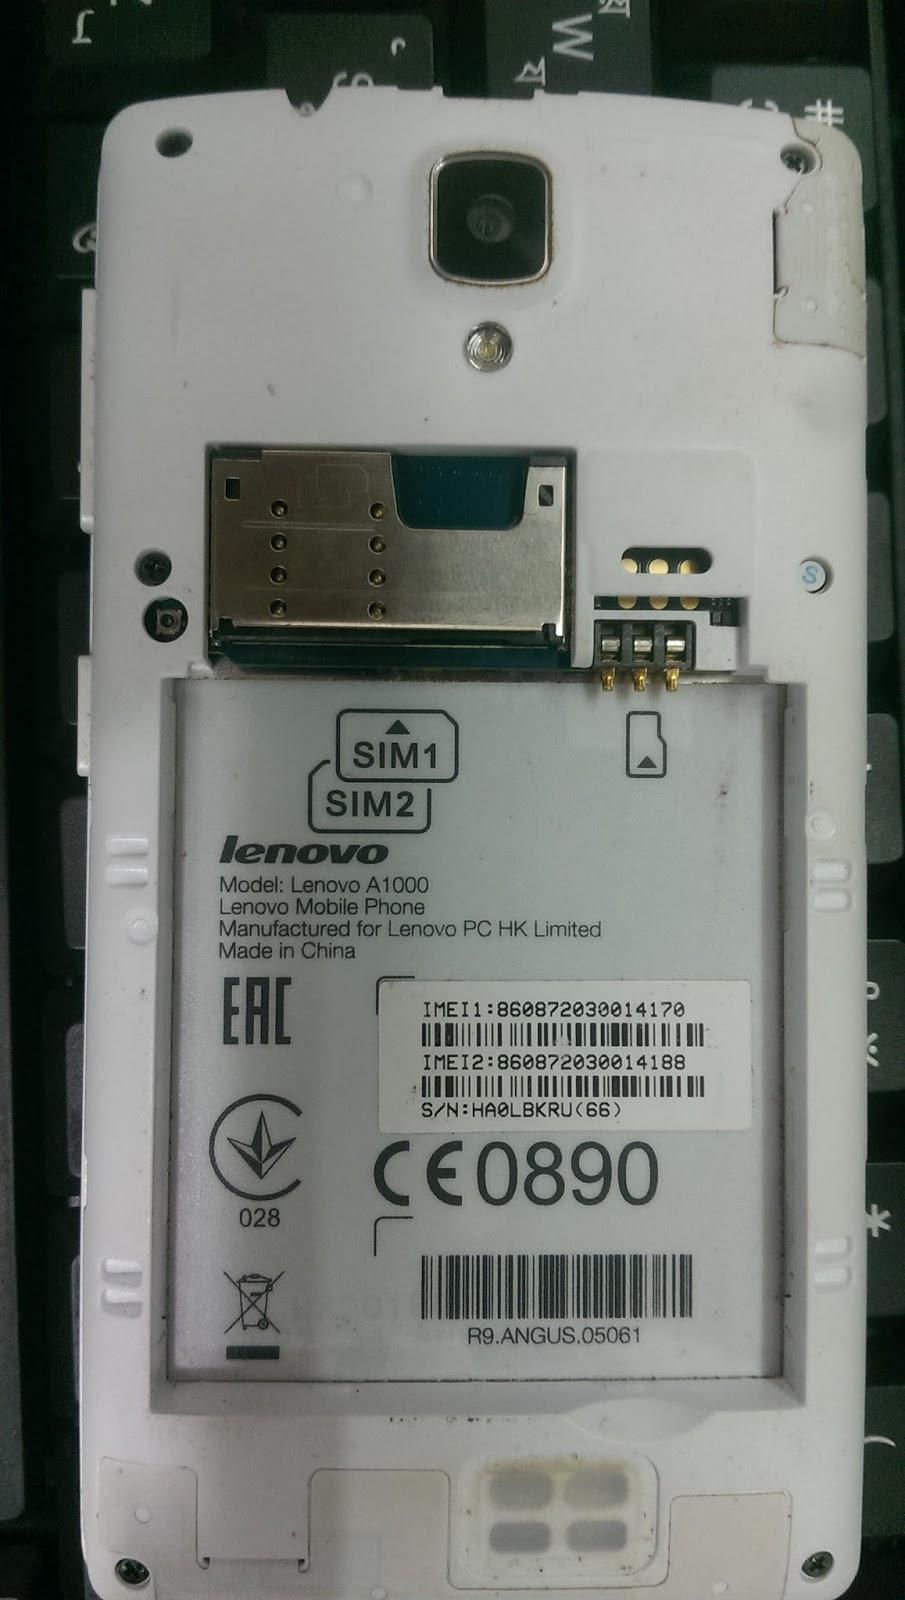 LENOVO A1000 LCD FIX, DISPLAY BLANKING, HANG LOGO, DEAD BOOT REPAIR